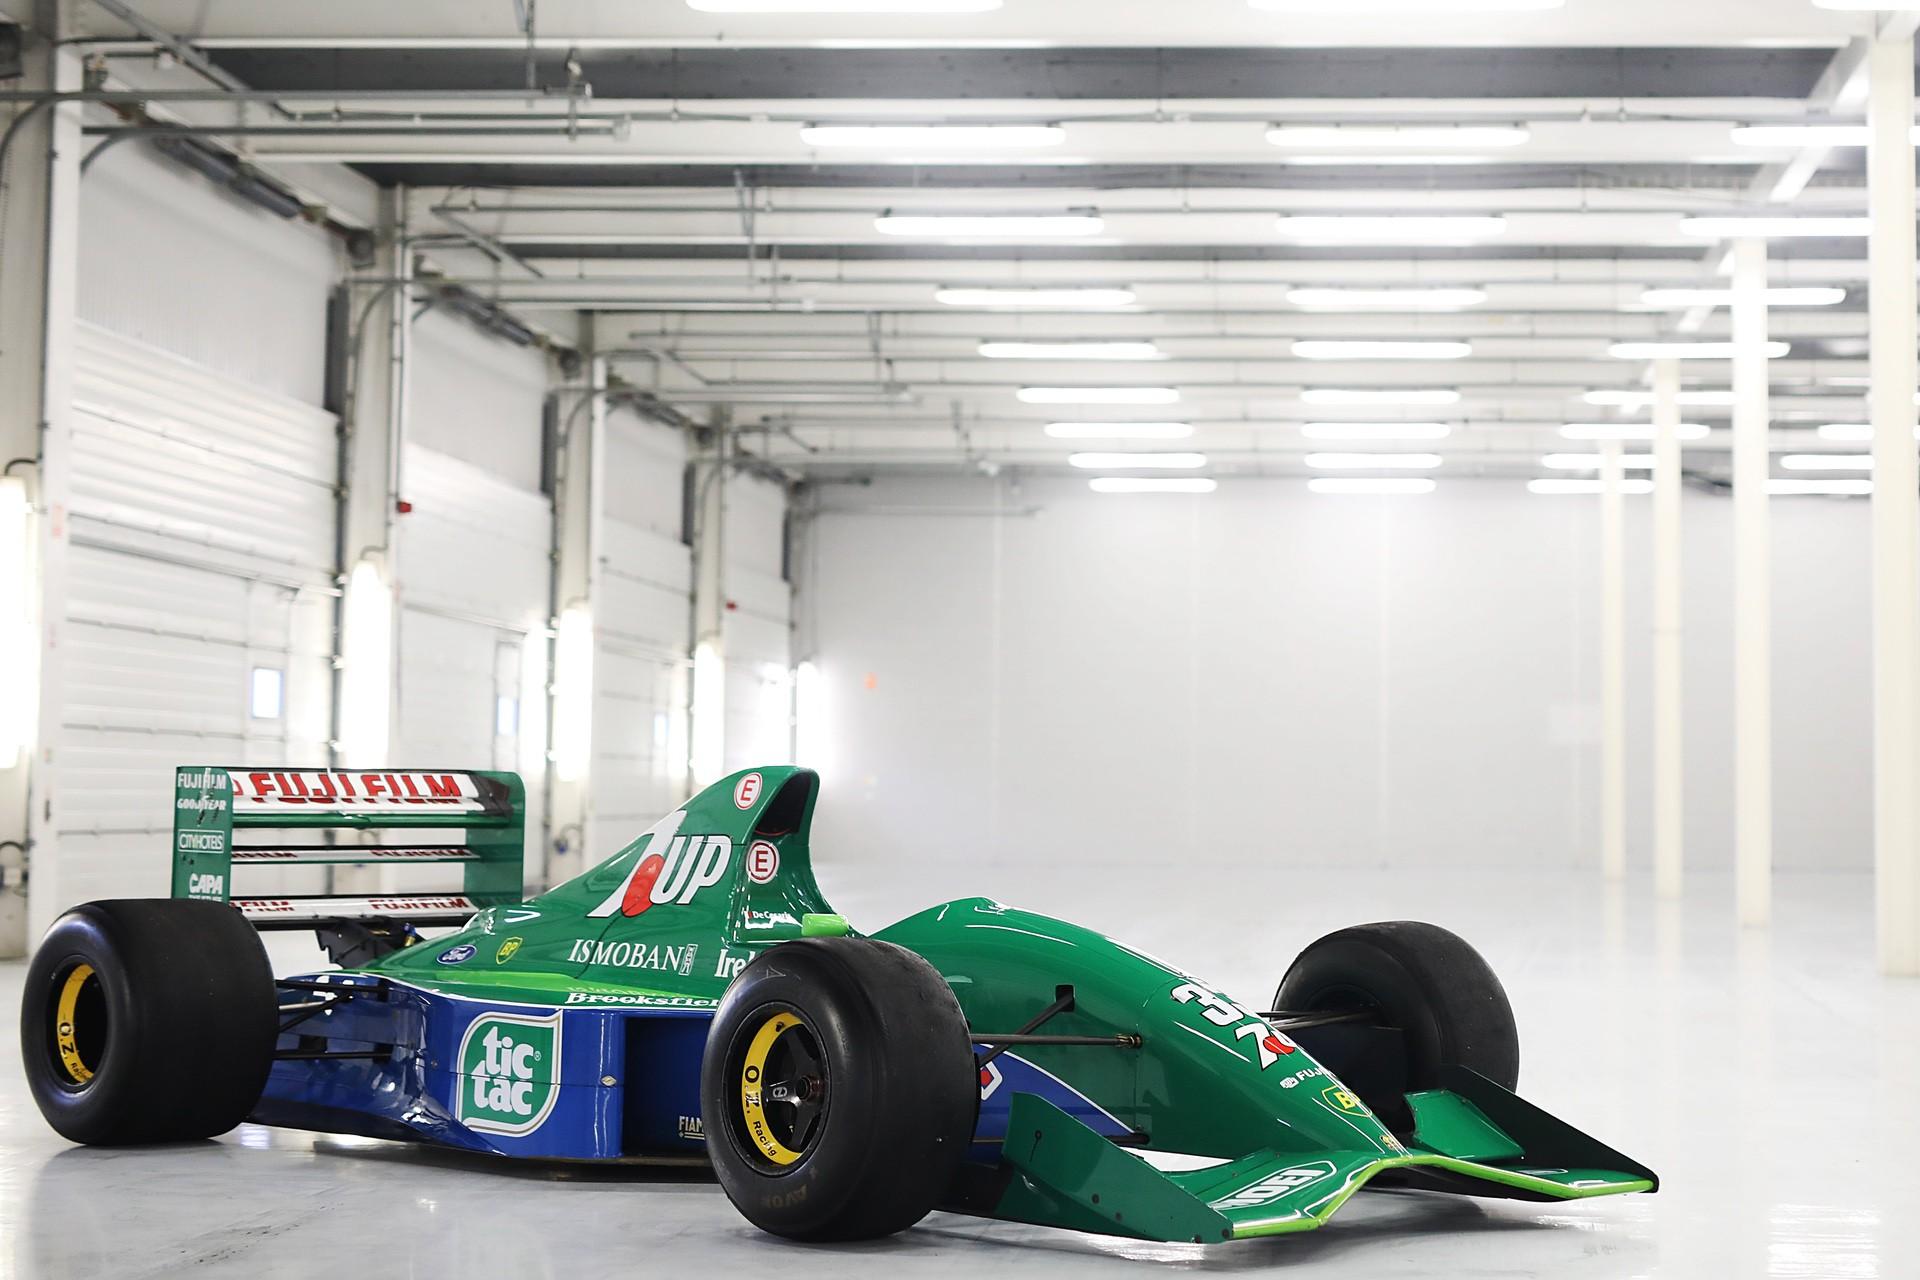 Michael_Schumacher_Jordan_F1_debut-0002